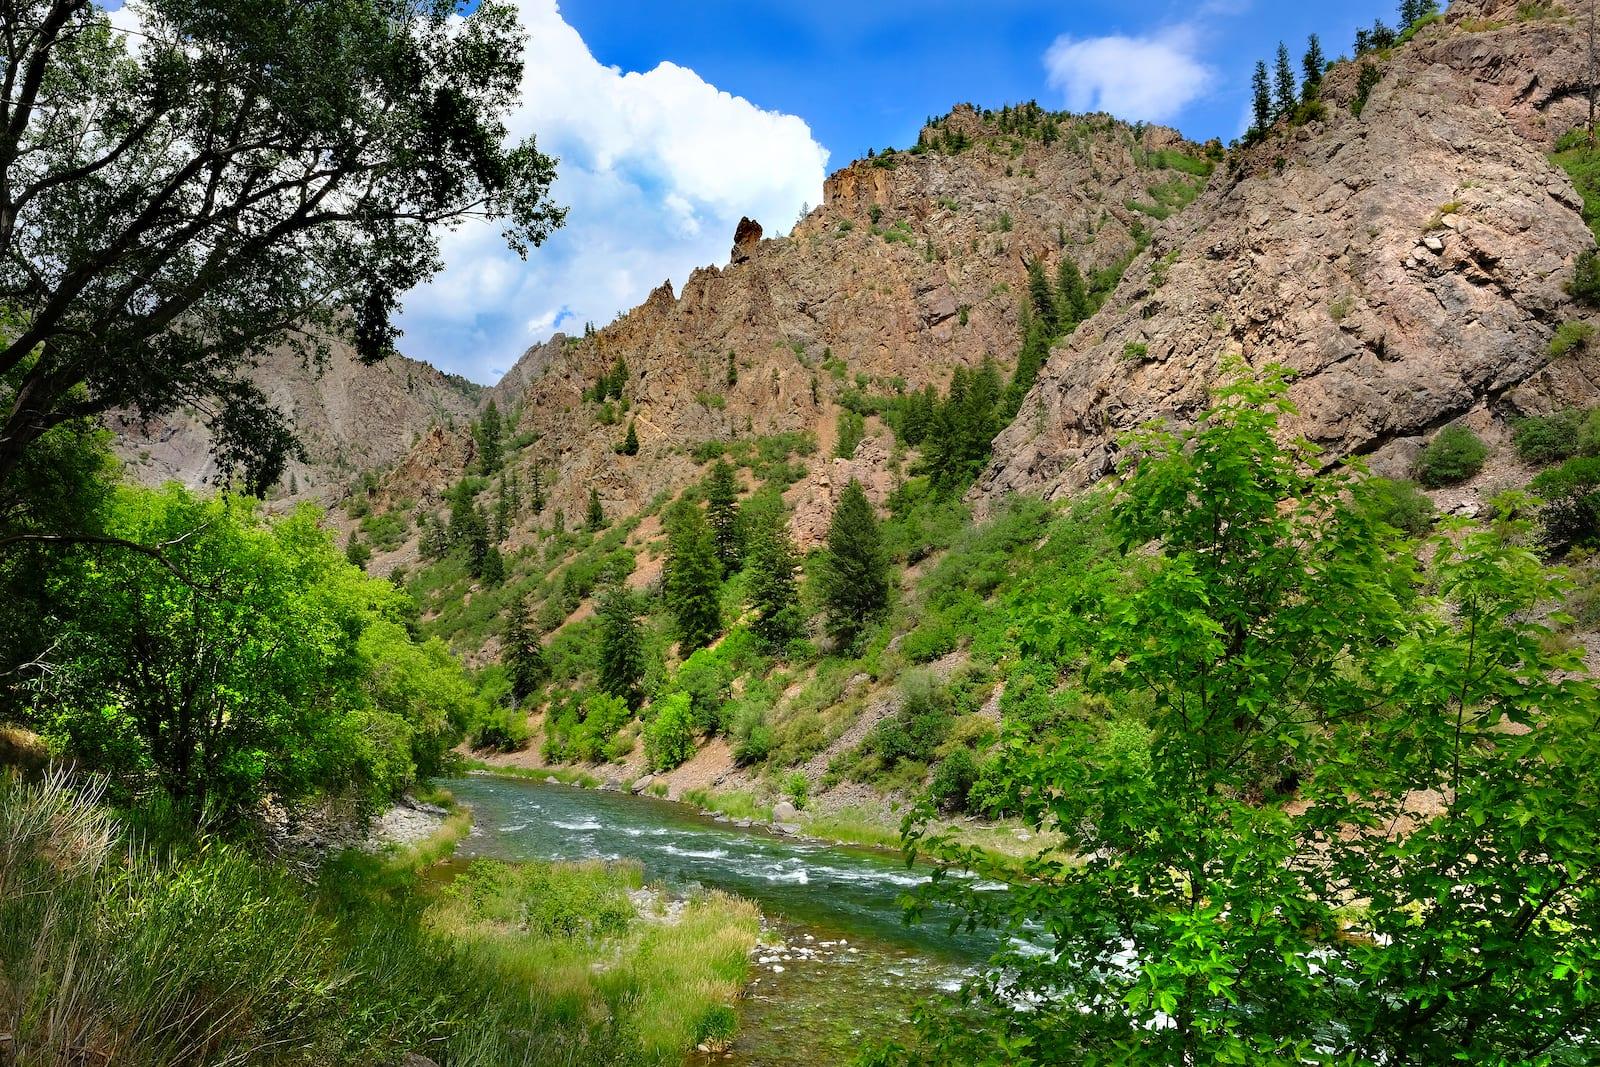 Gunnison River at East Portal Black Canyon National Park, CO